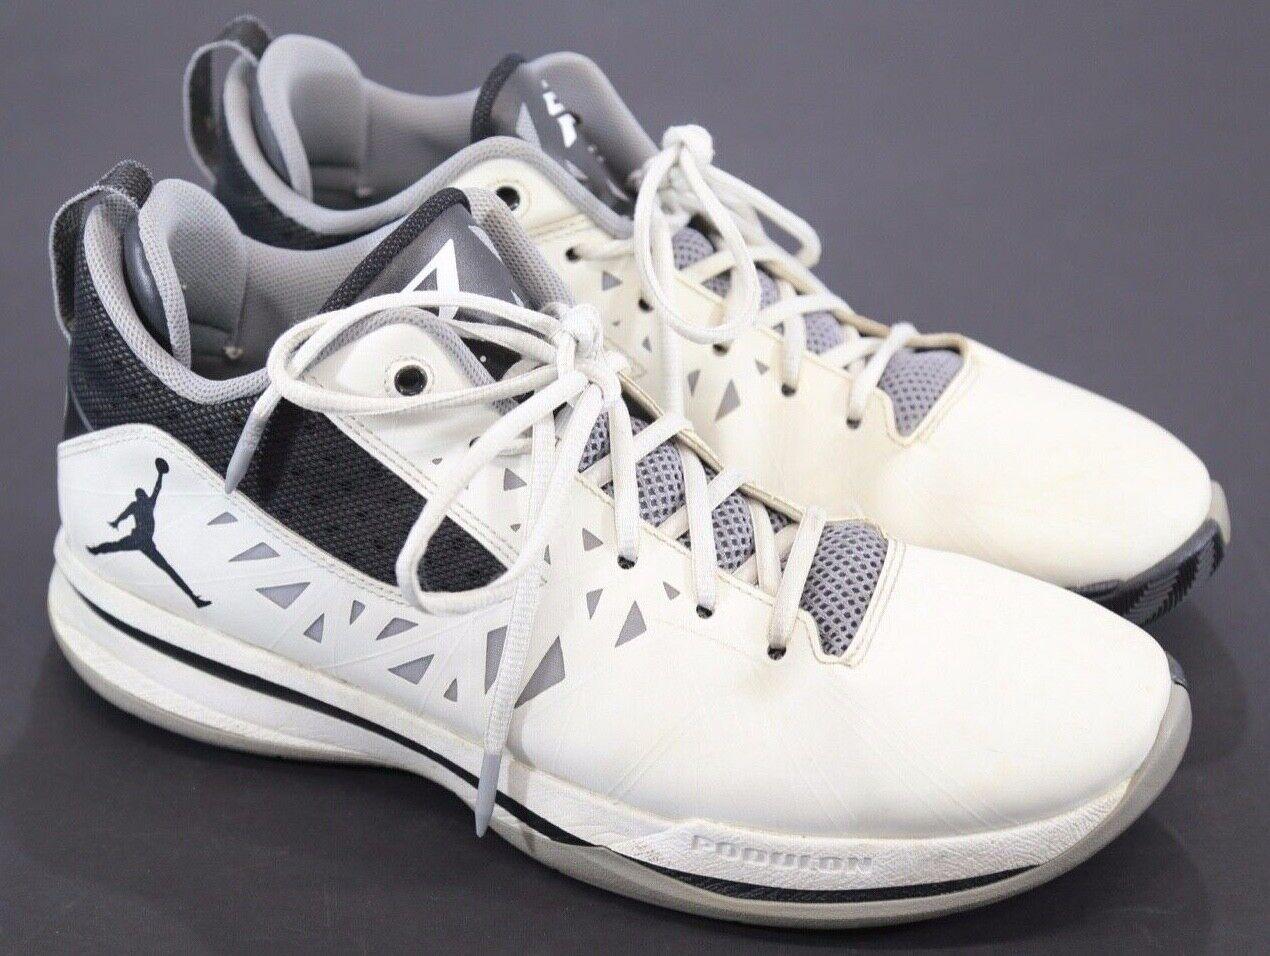 jordan uomini 2011 podulan podulan podulan nike basket scarpe scarpe da ginnastica sz 10,5 | Consegna Immediata  | all'ingrosso  | vendita all'asta  | Sig/Sig Ra Scarpa  | Sig/Sig Ra Scarpa  | Uomo/Donna Scarpa  e7a634